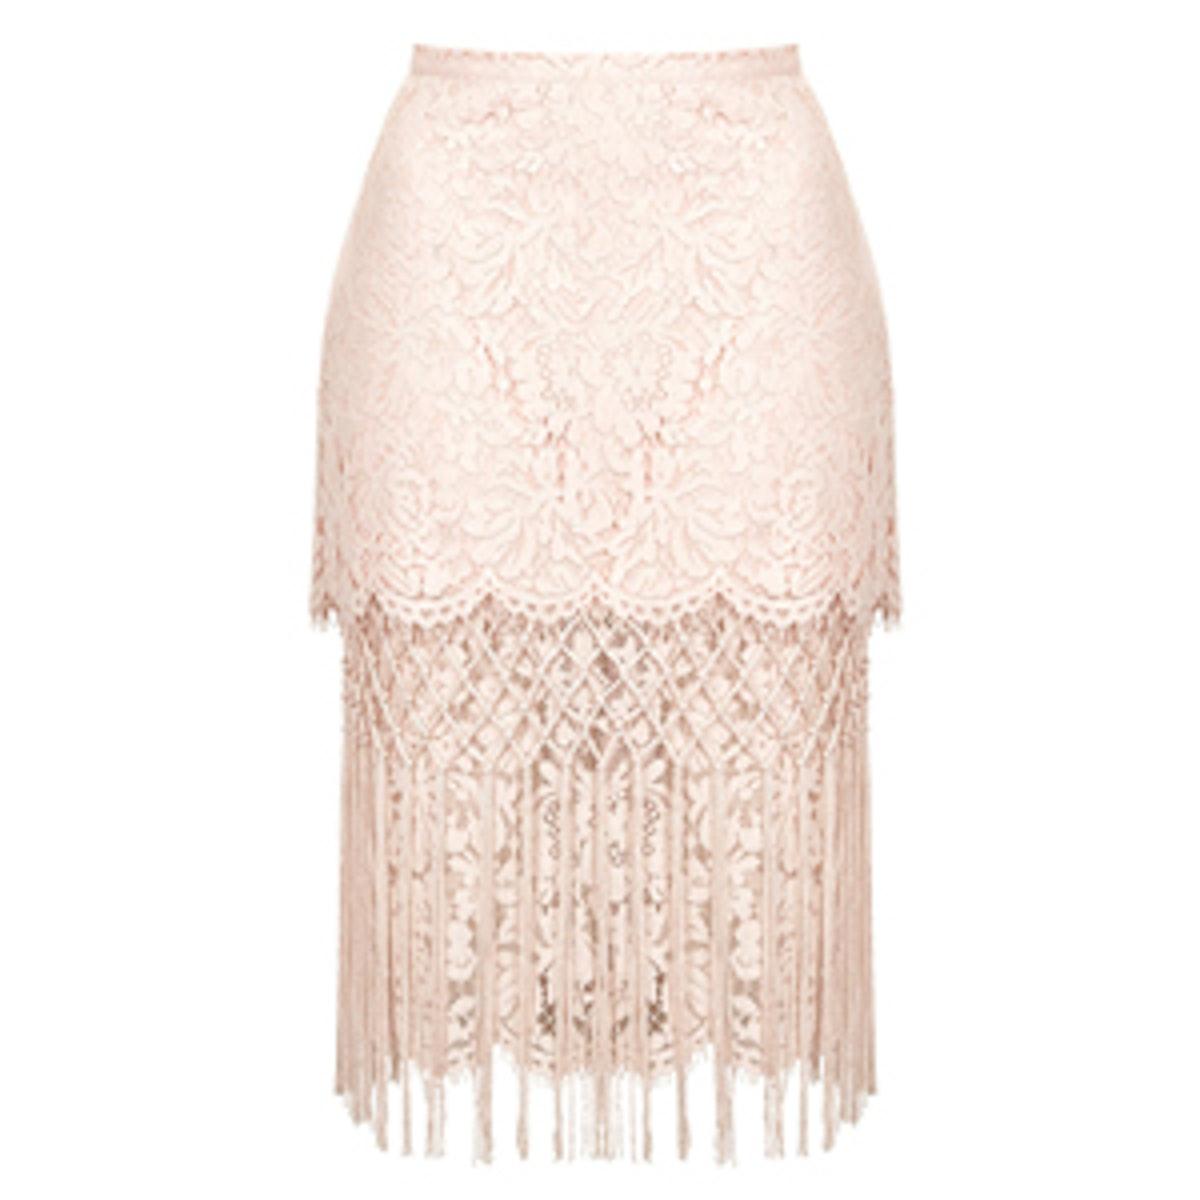 Fringe Lace Pencil Skirt